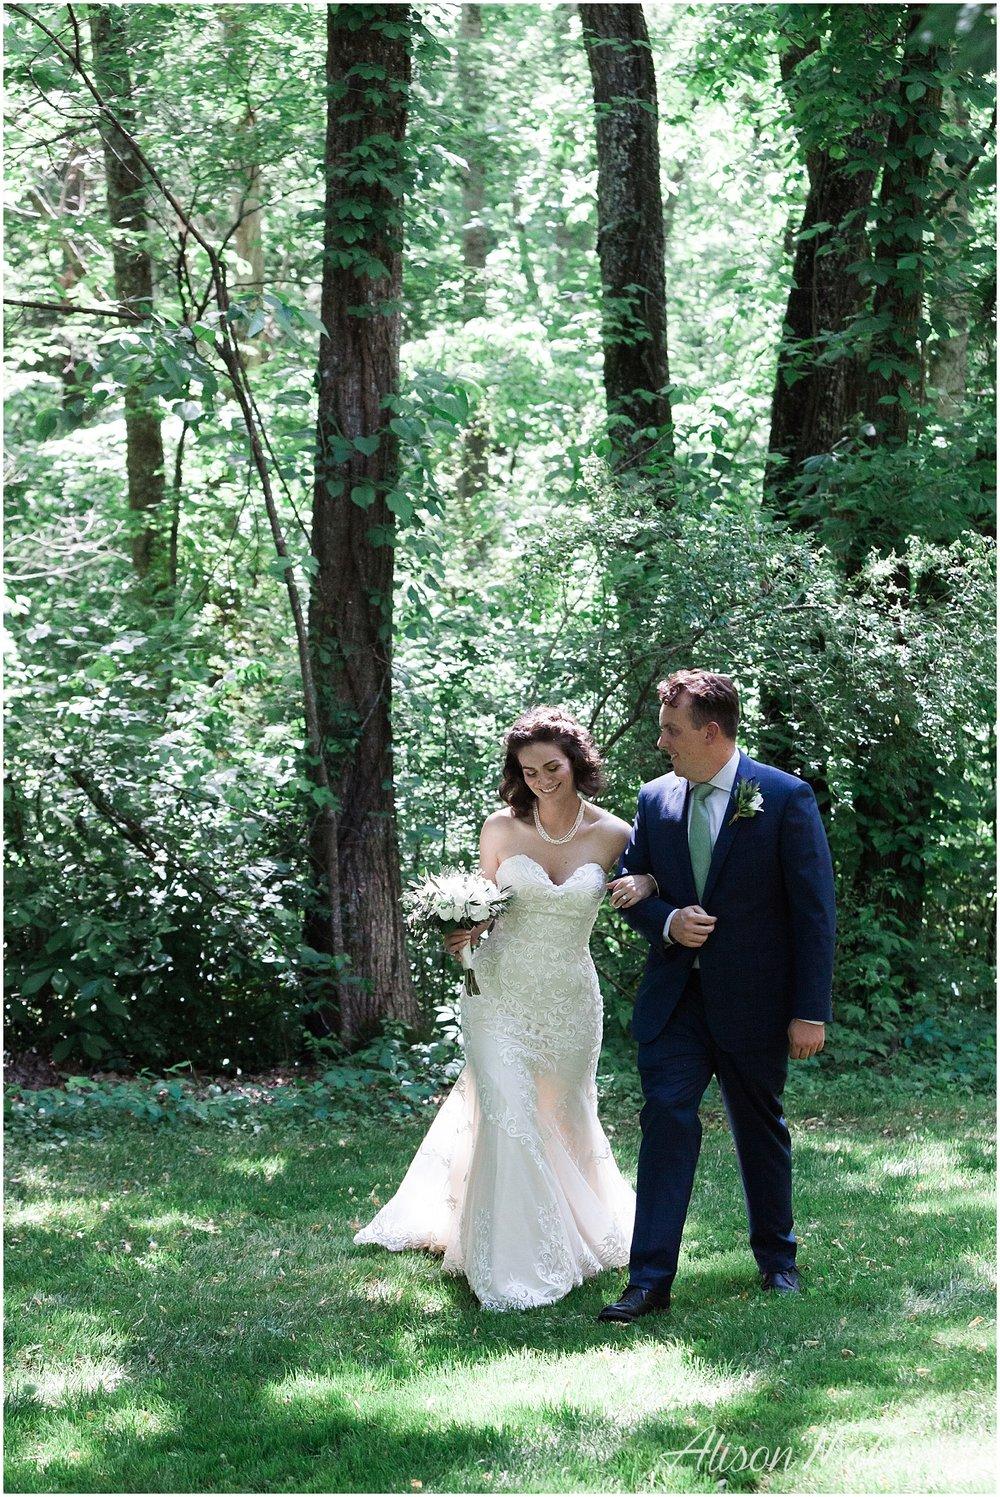 2018-05-23_0001LandC_wedding_dancingbearlodge_townsend_tn_amp.jpg